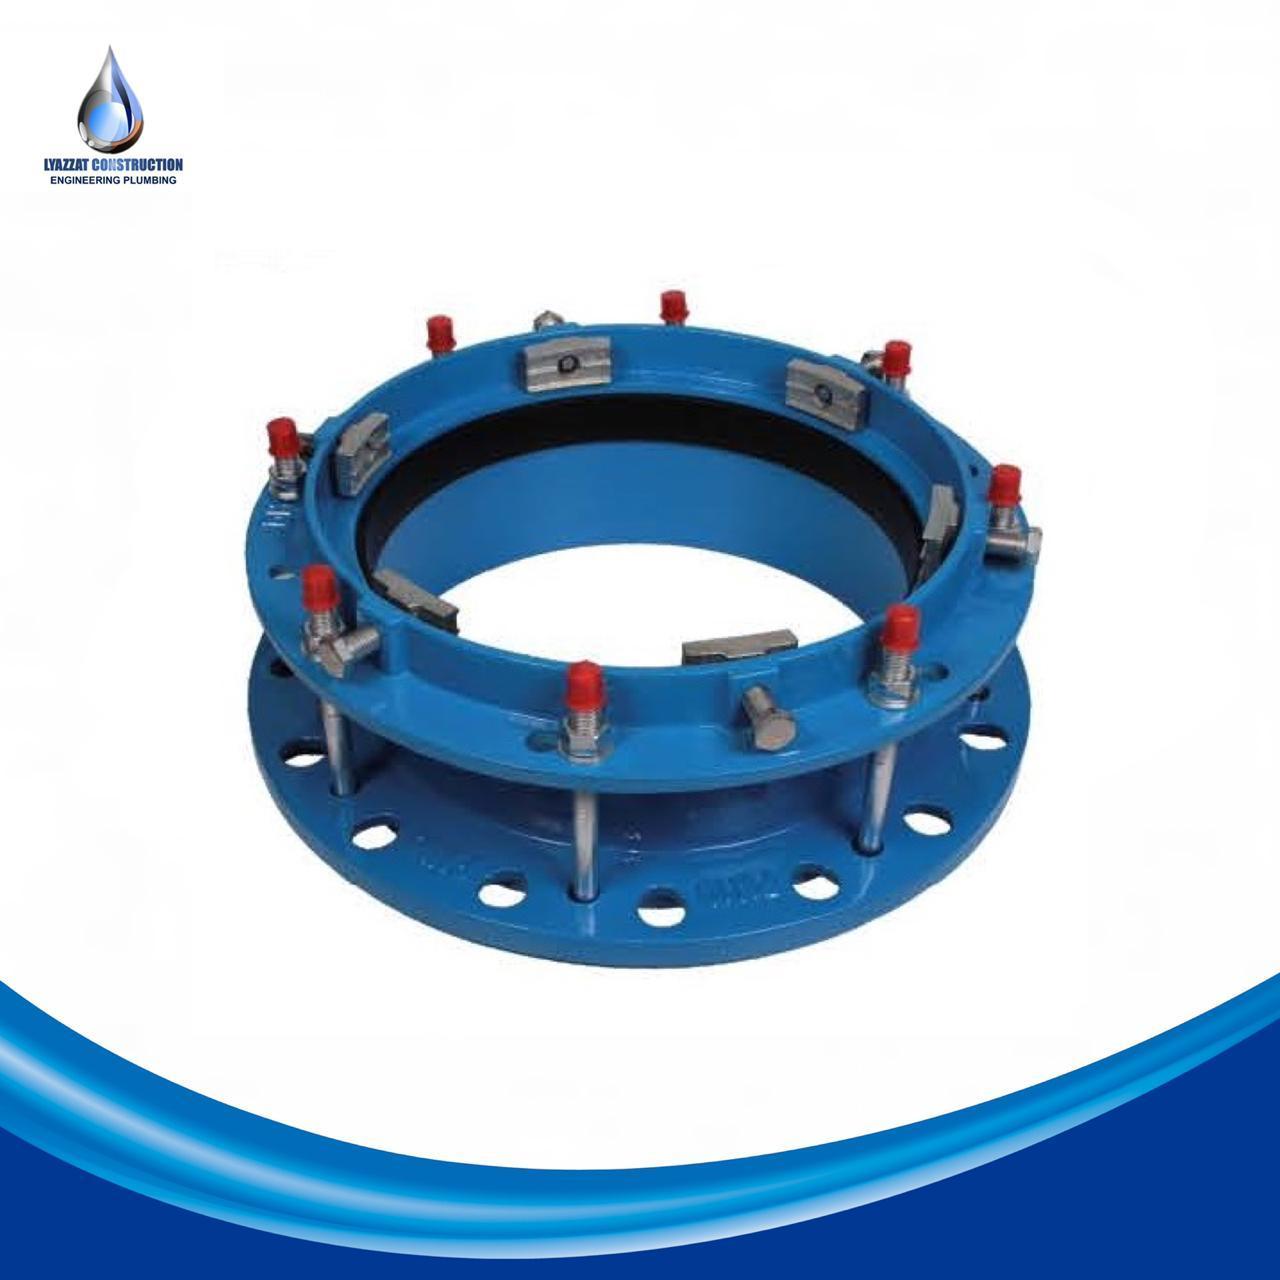 Фланец фиксирующий для ПЭ и ПВХ труб DN 500/500 PN10-16